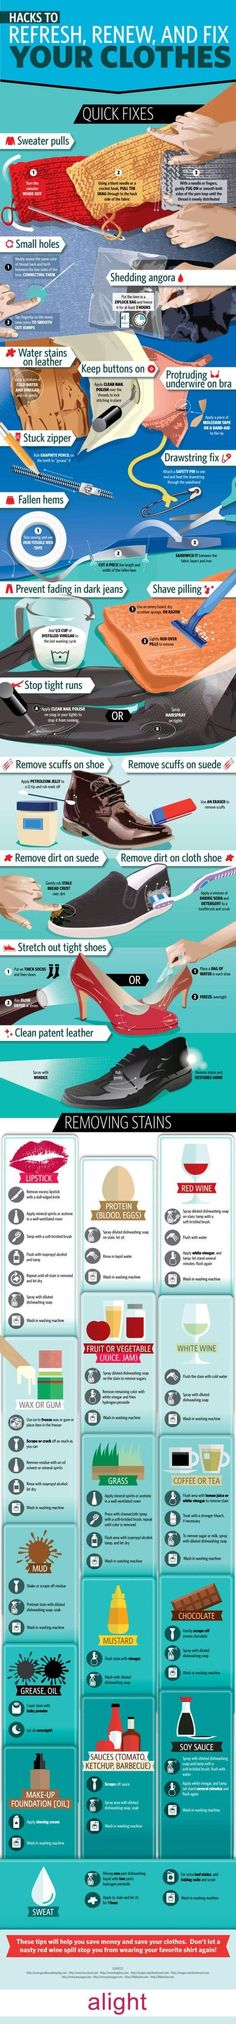 Clothing Repair Hacks Common Fixes